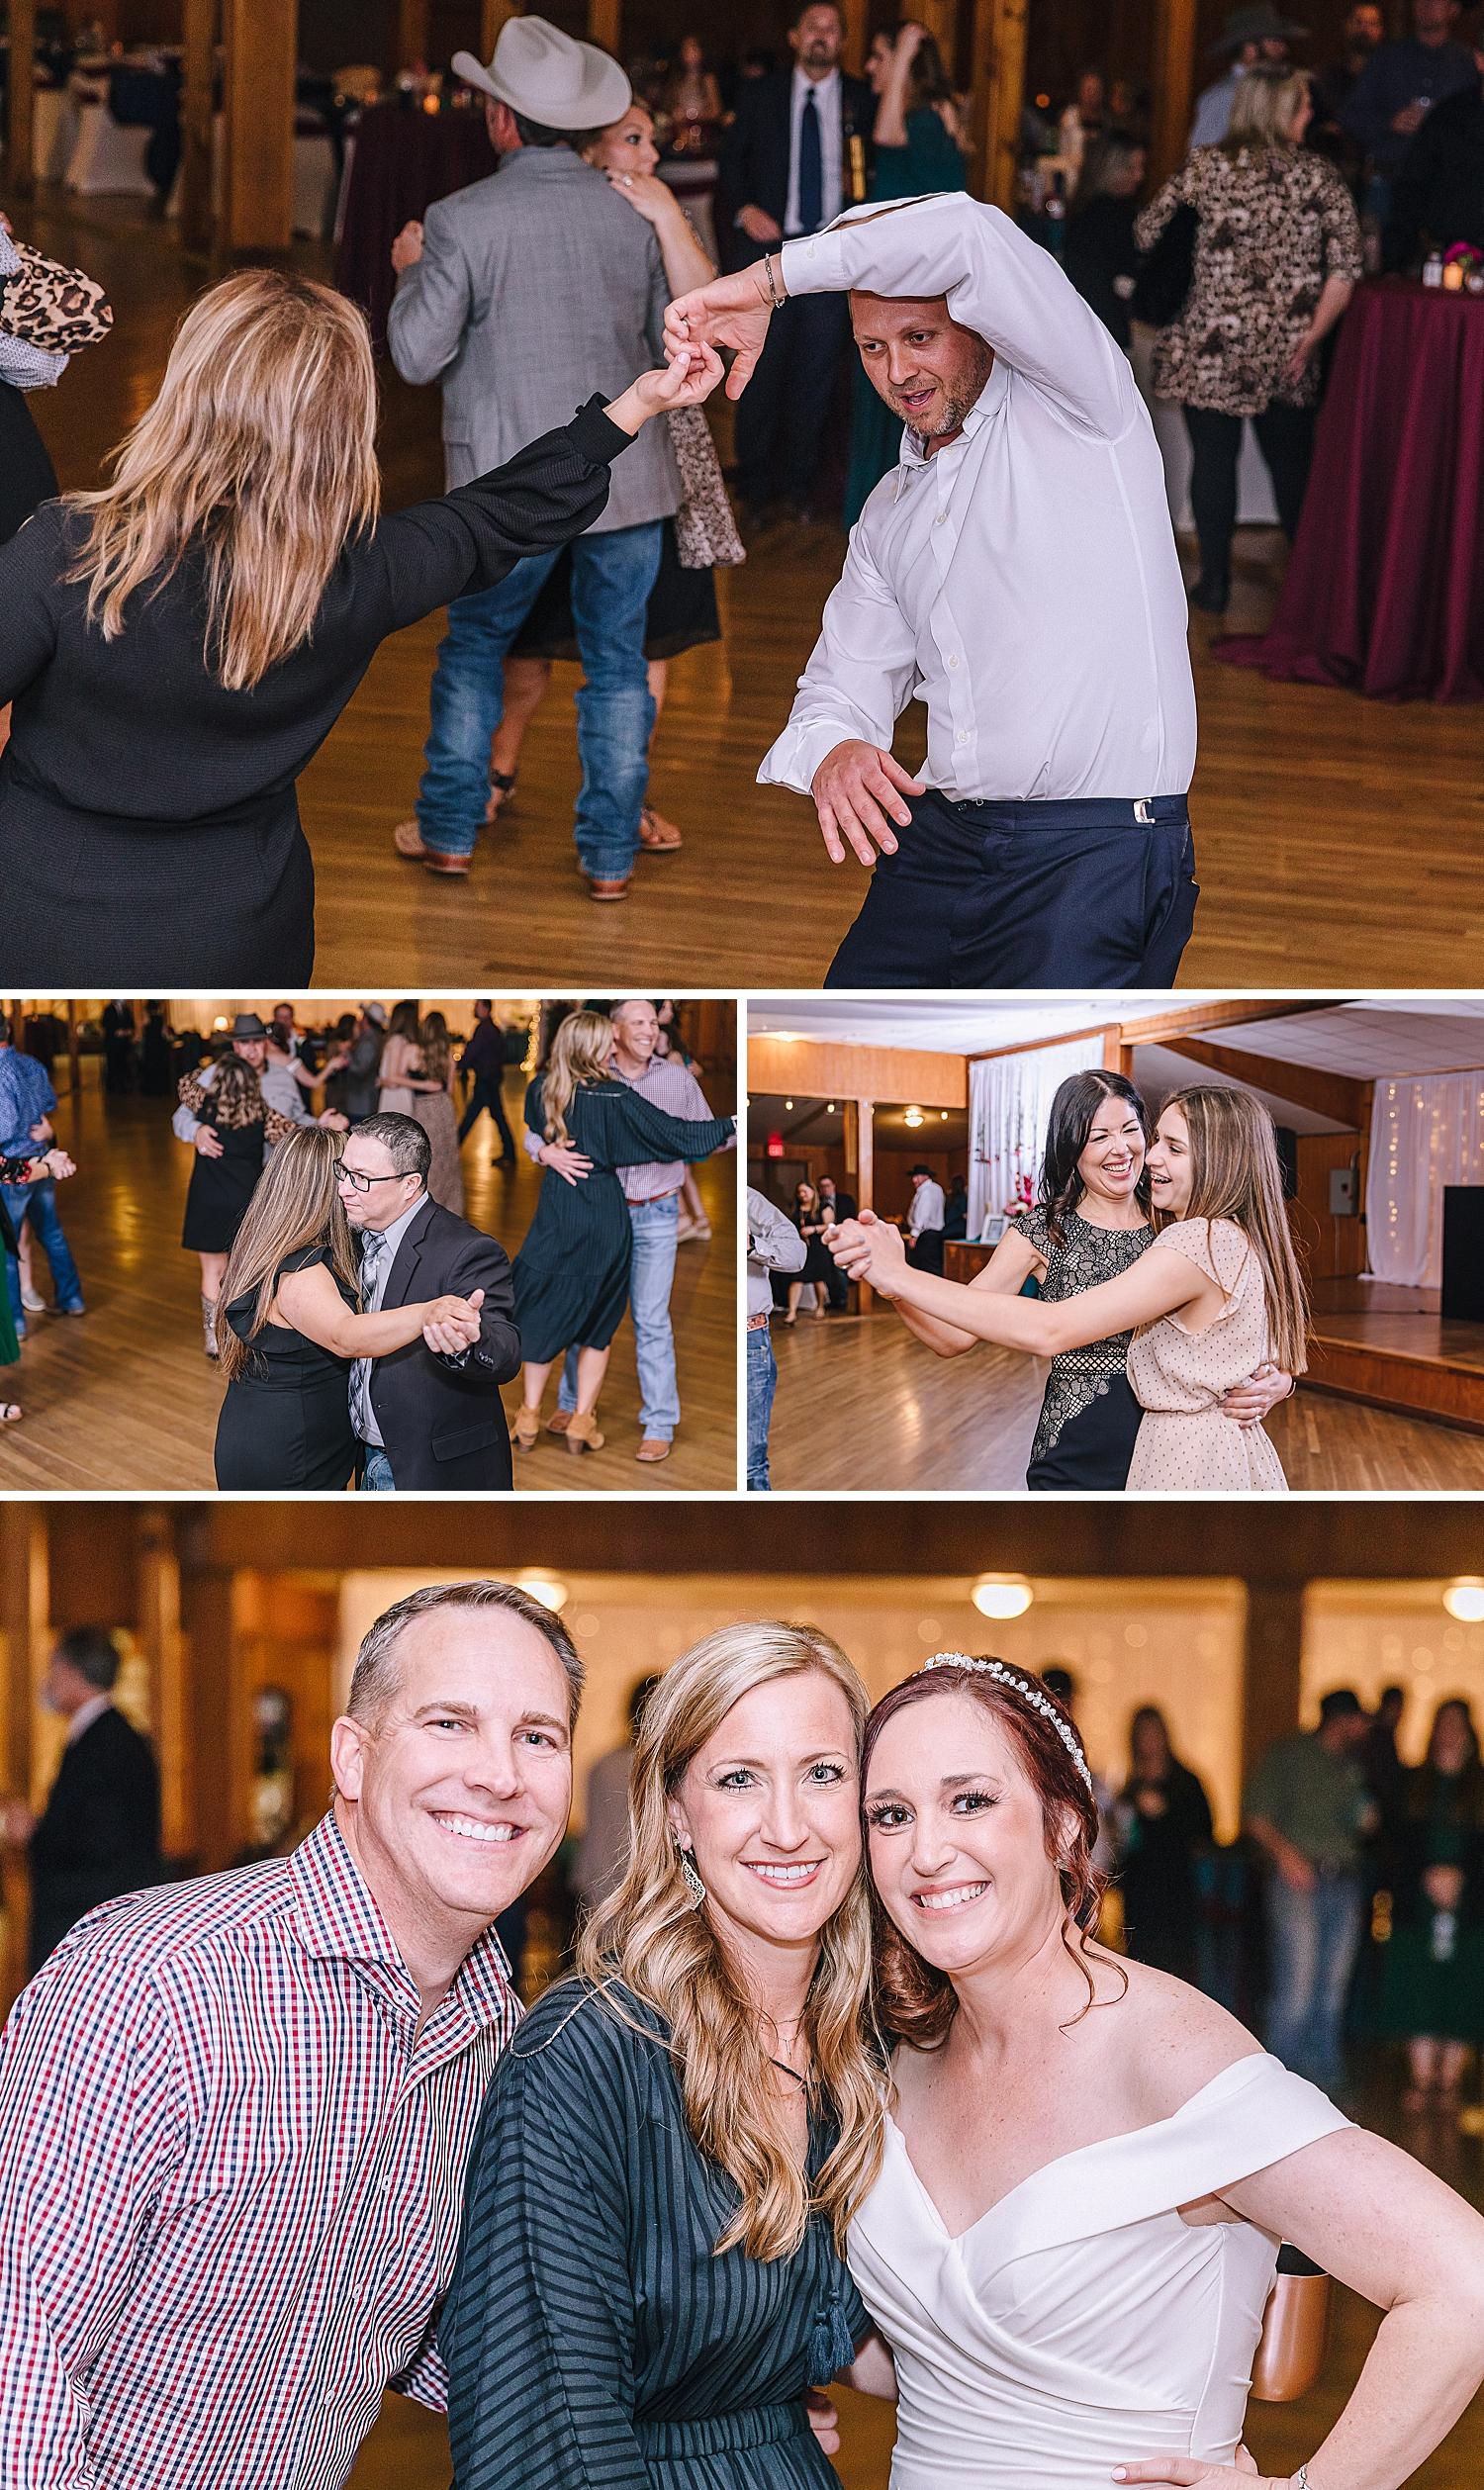 Jewel-Tone-Texas-Wedding-Valerie-Jason-Carly-Barton-Photography_0107.jpg